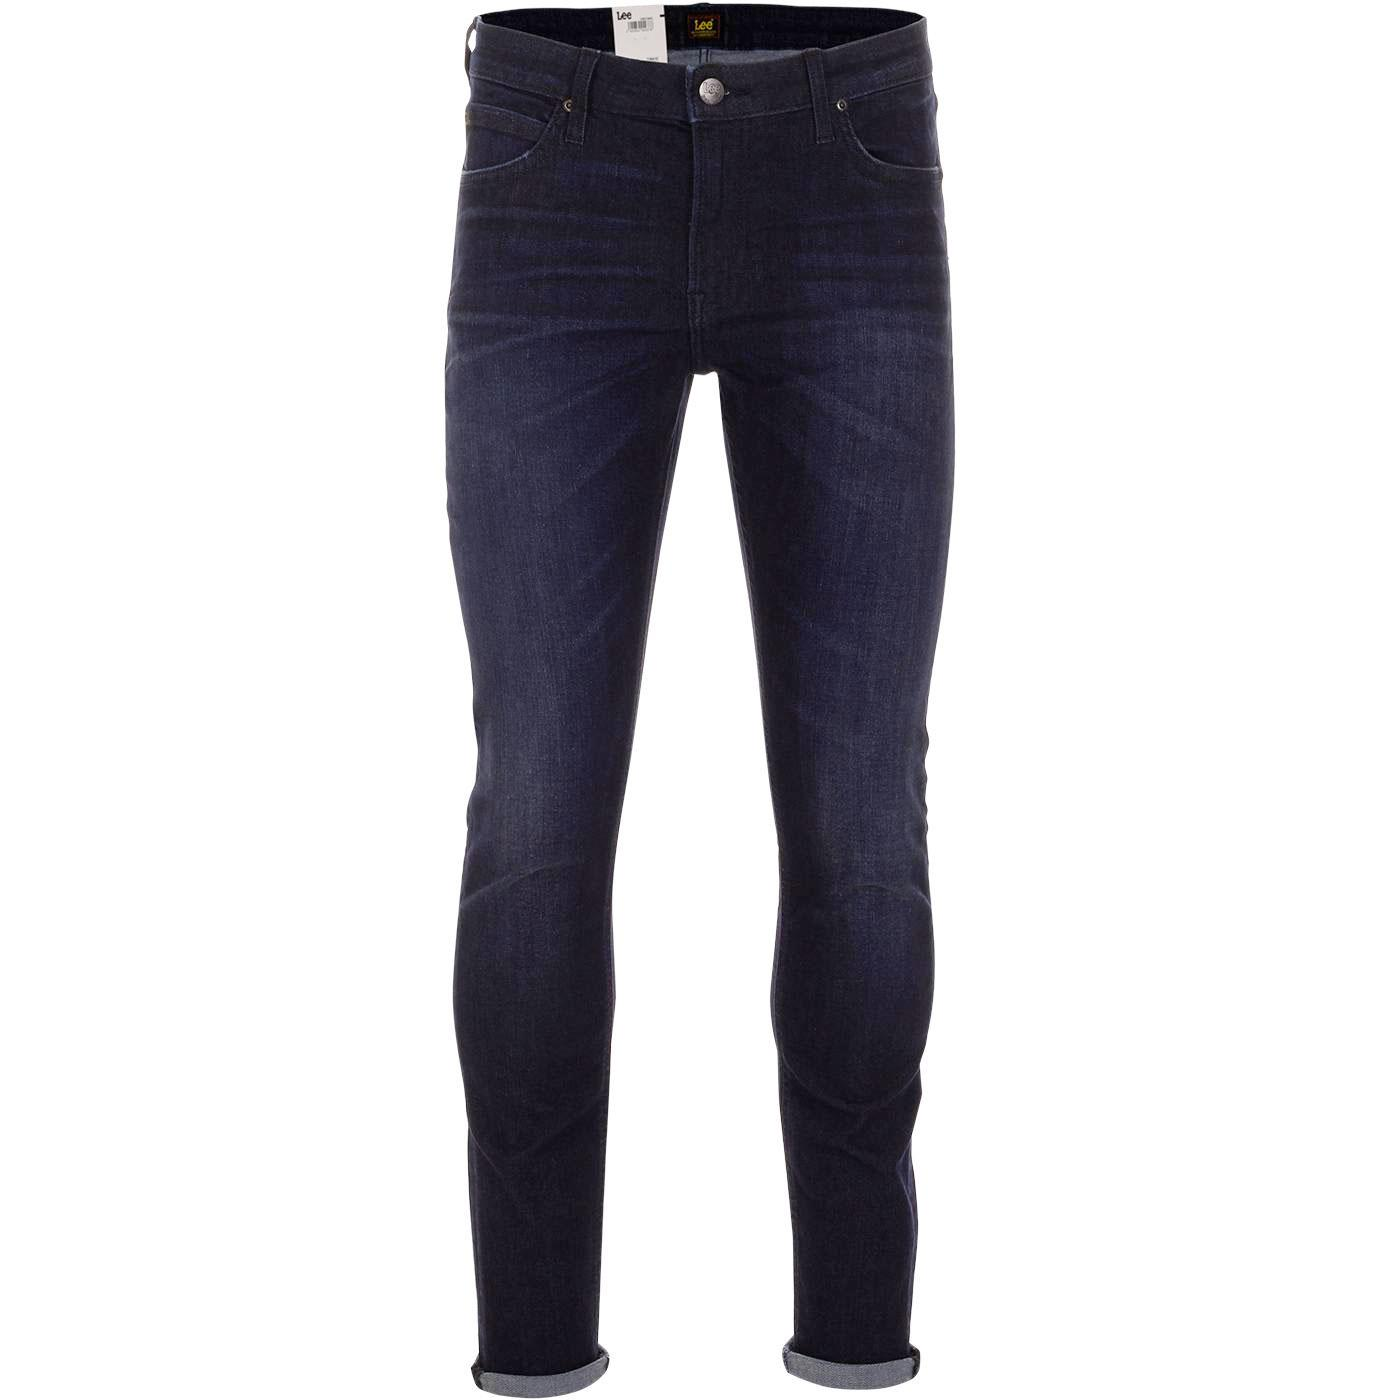 Malone LEE JEANS Retro Skinny Jeans (Pine Blue)